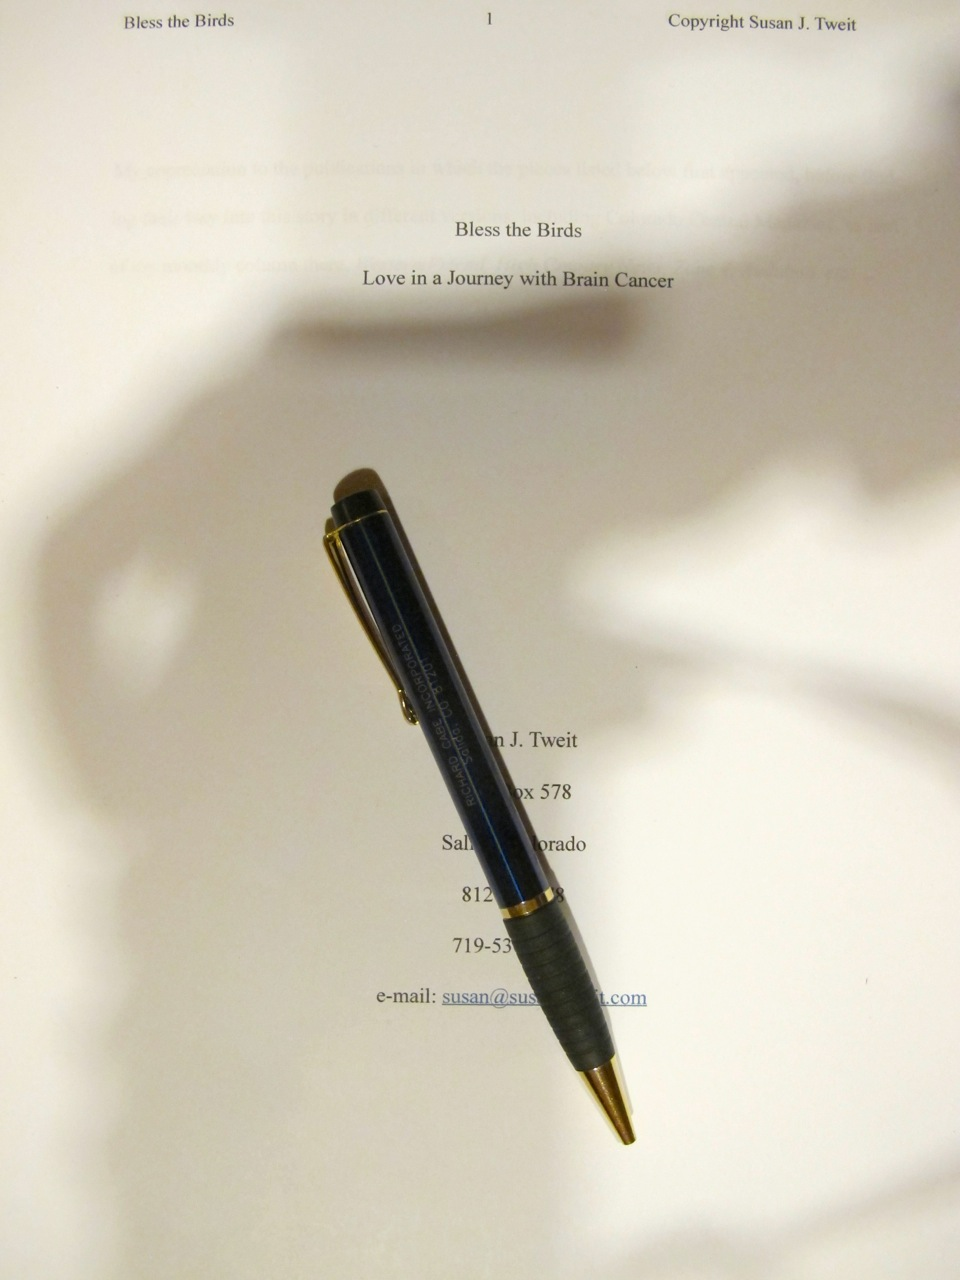 Manuscript and Richard's pen